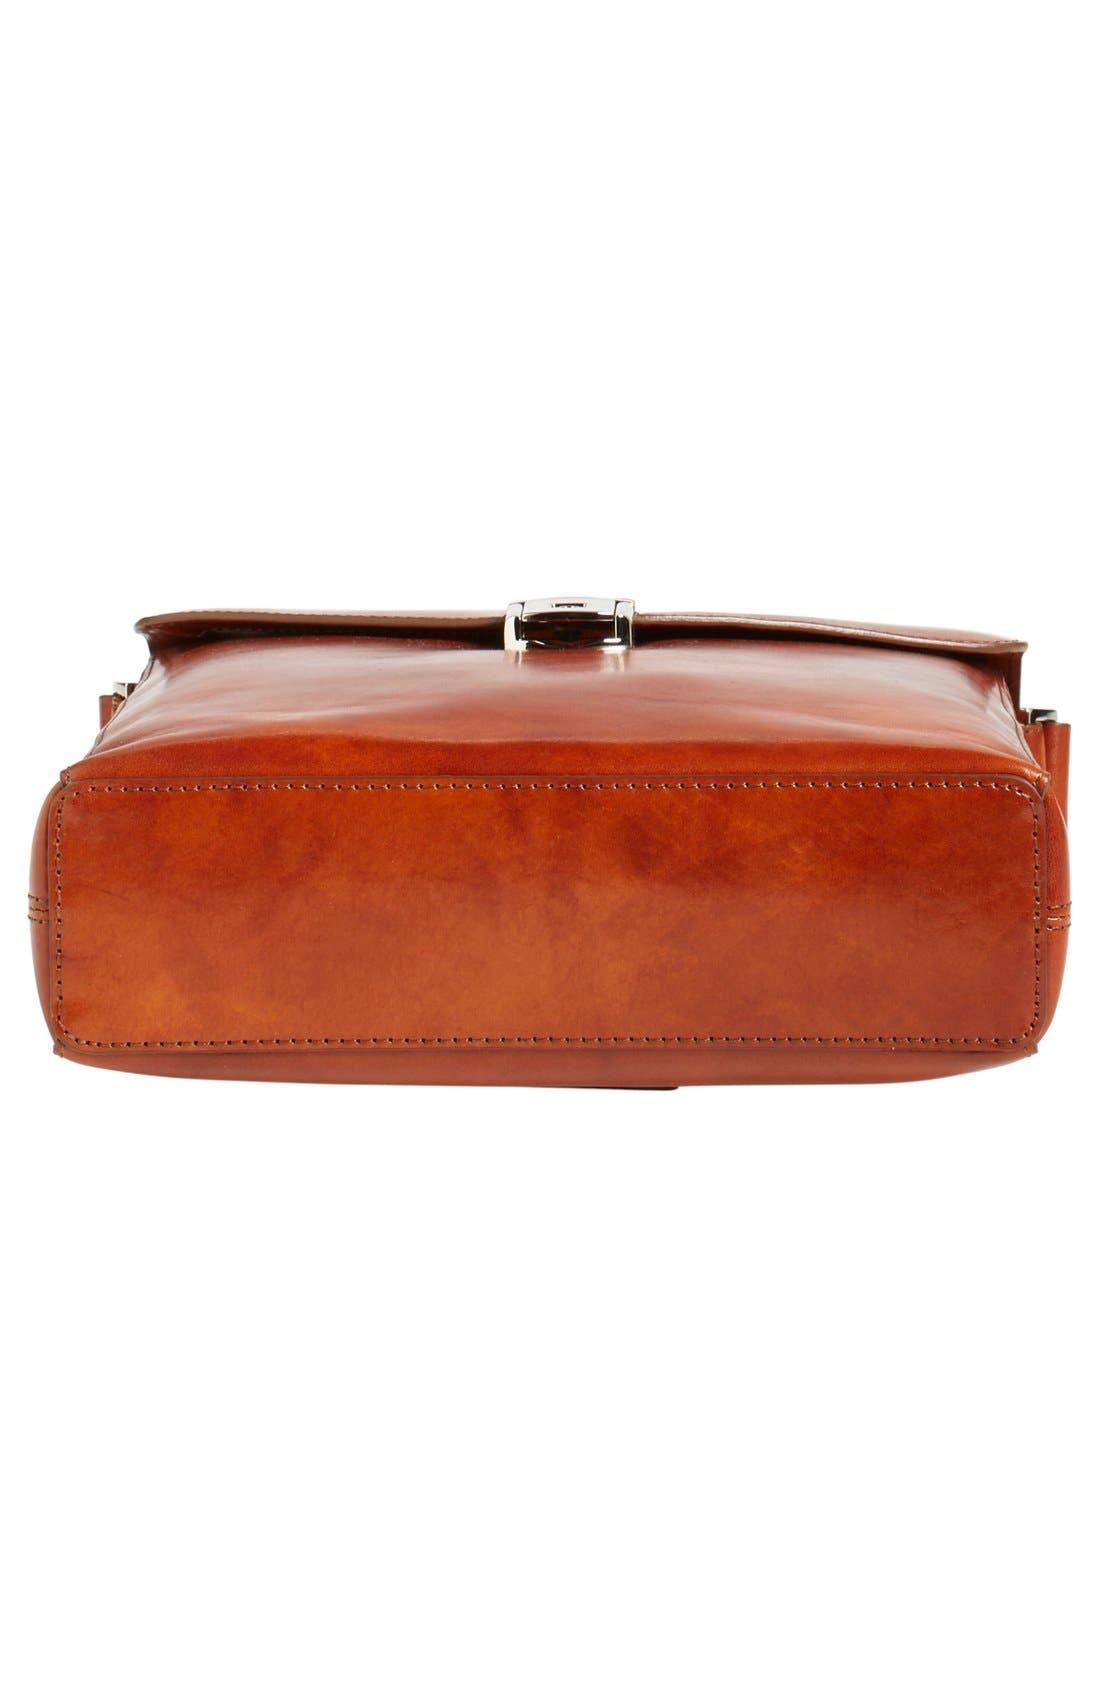 'Man Bag' Leather Crossbody Bag,                             Alternate thumbnail 6, color,                             233